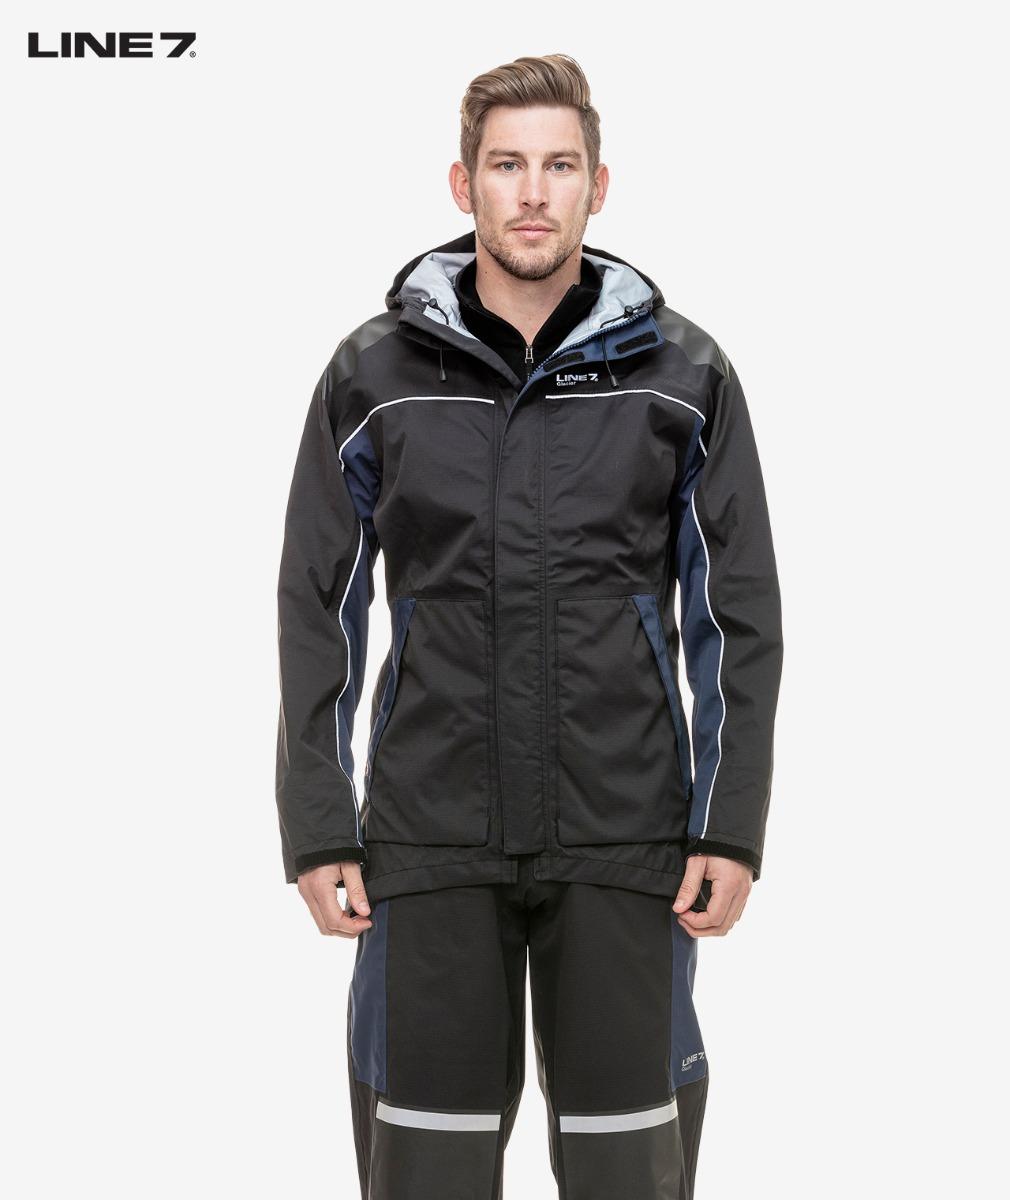 Line 7 Men's Glacier Waterproof Jacket in Black